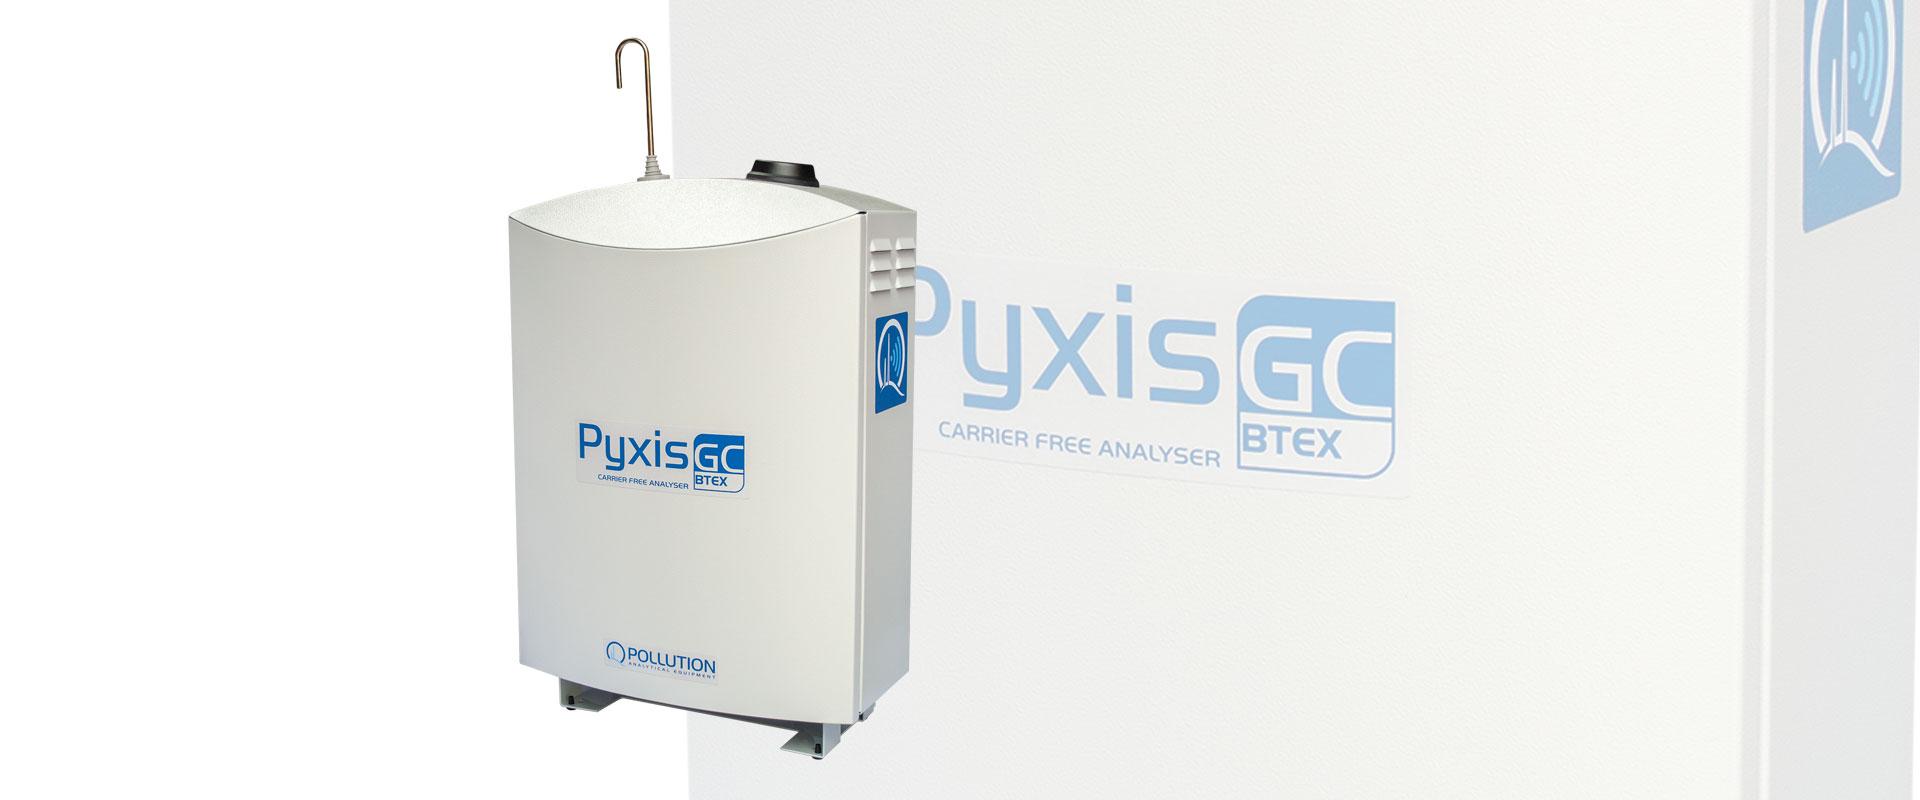 Pyxis GC BTEX